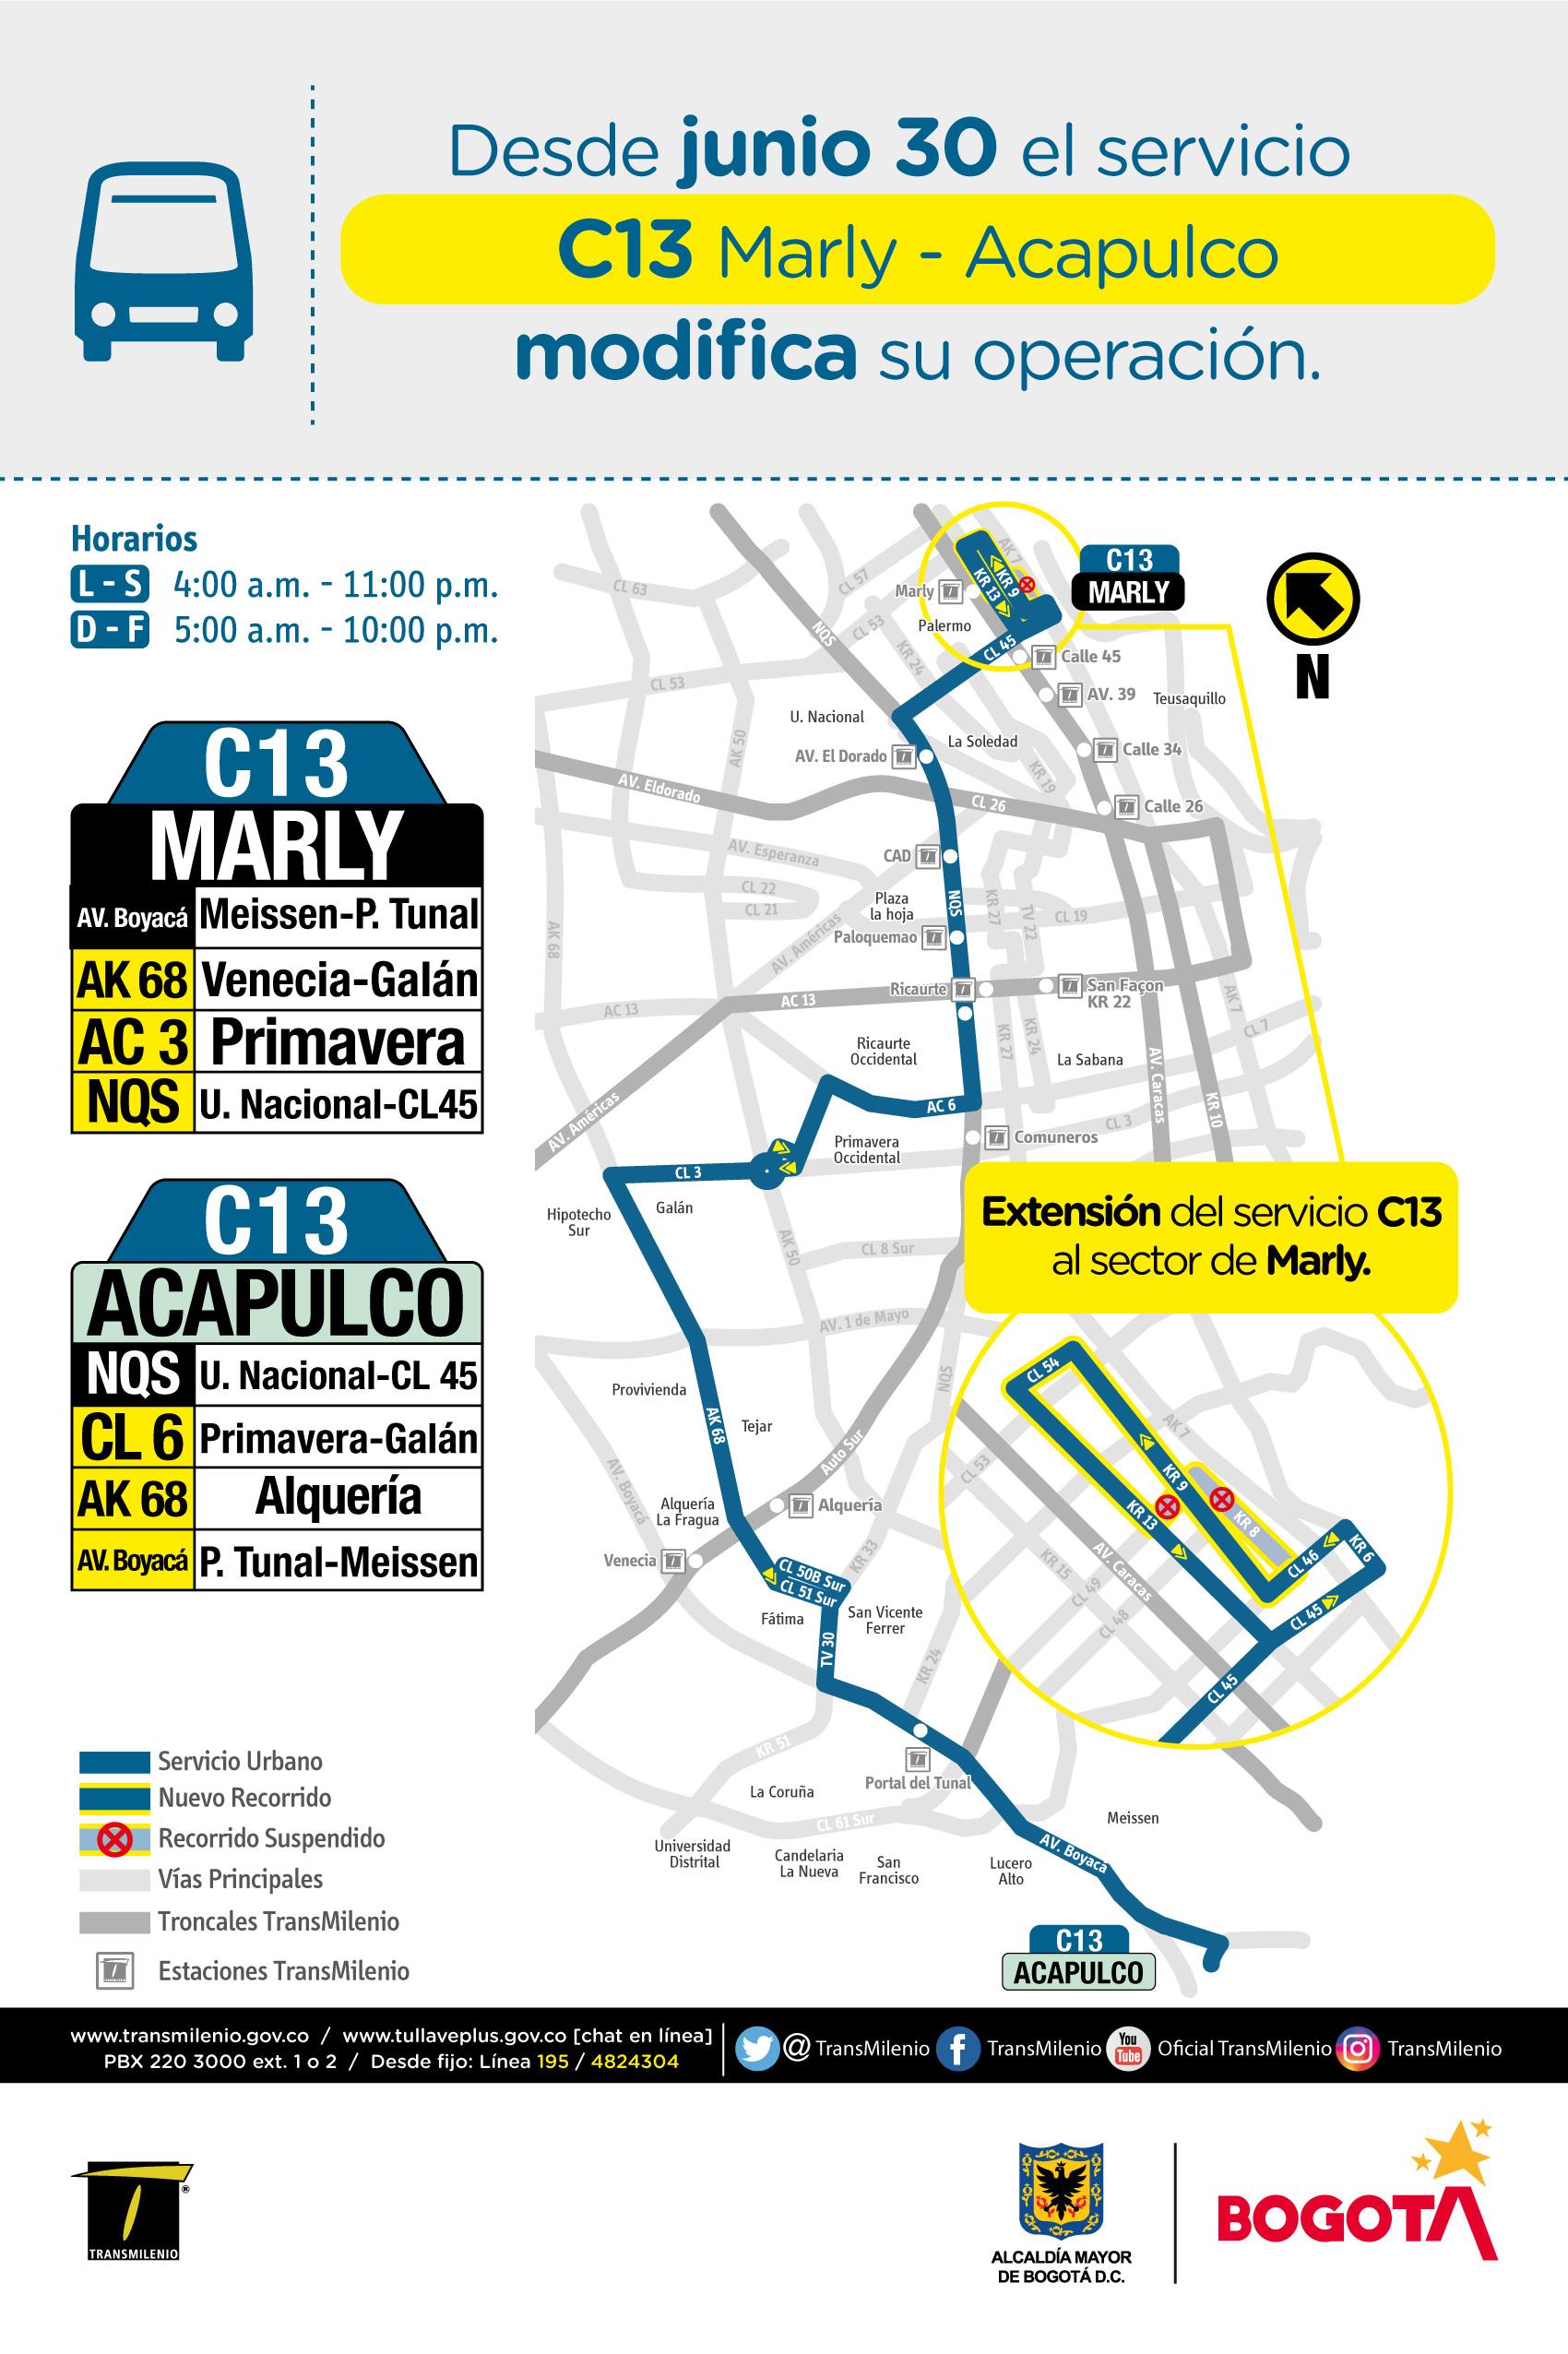 Mapa de la ruta C13 con modificaciones operacionales